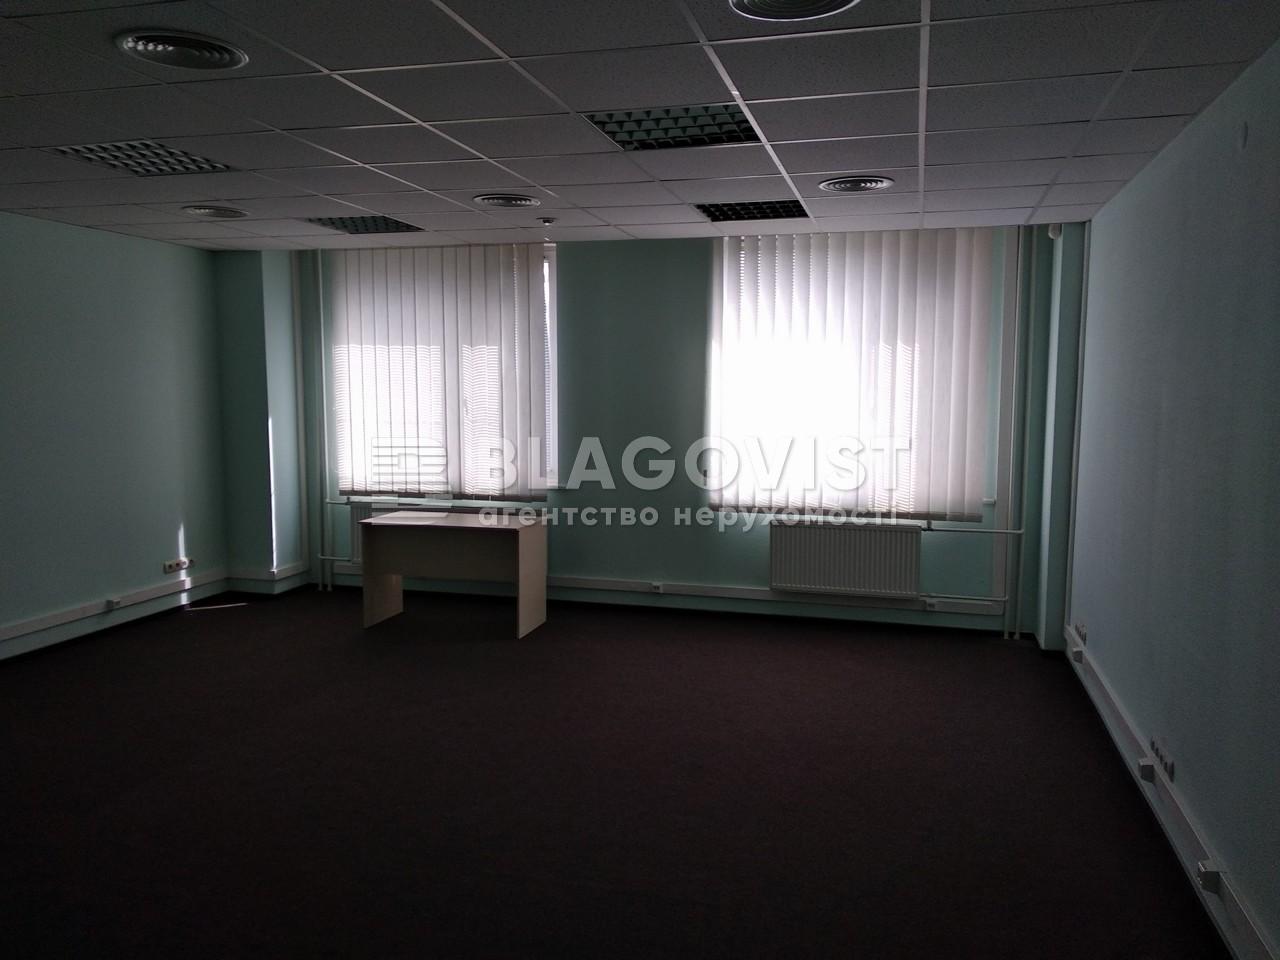 Офис, Гайдара, Киев, E-6932 - Фото 3